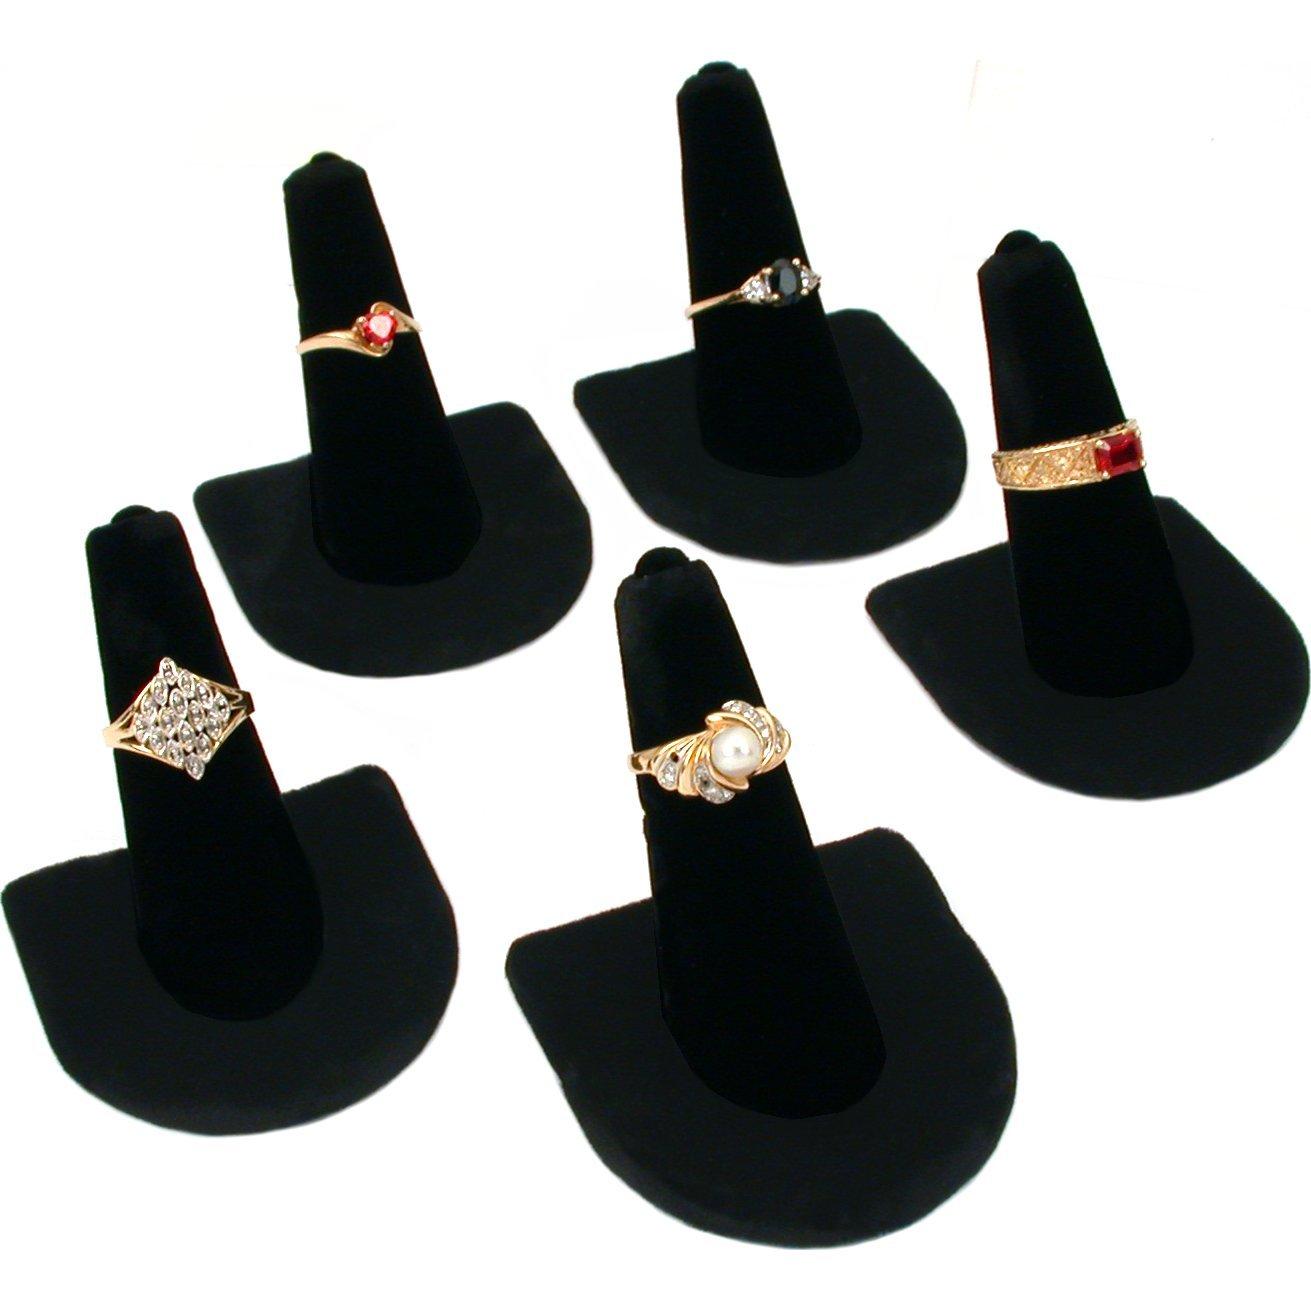 5 Black Velvet Ring Finger Jewelry Holder Showcase Display Stands Bejeweled Display 244-1 (5)